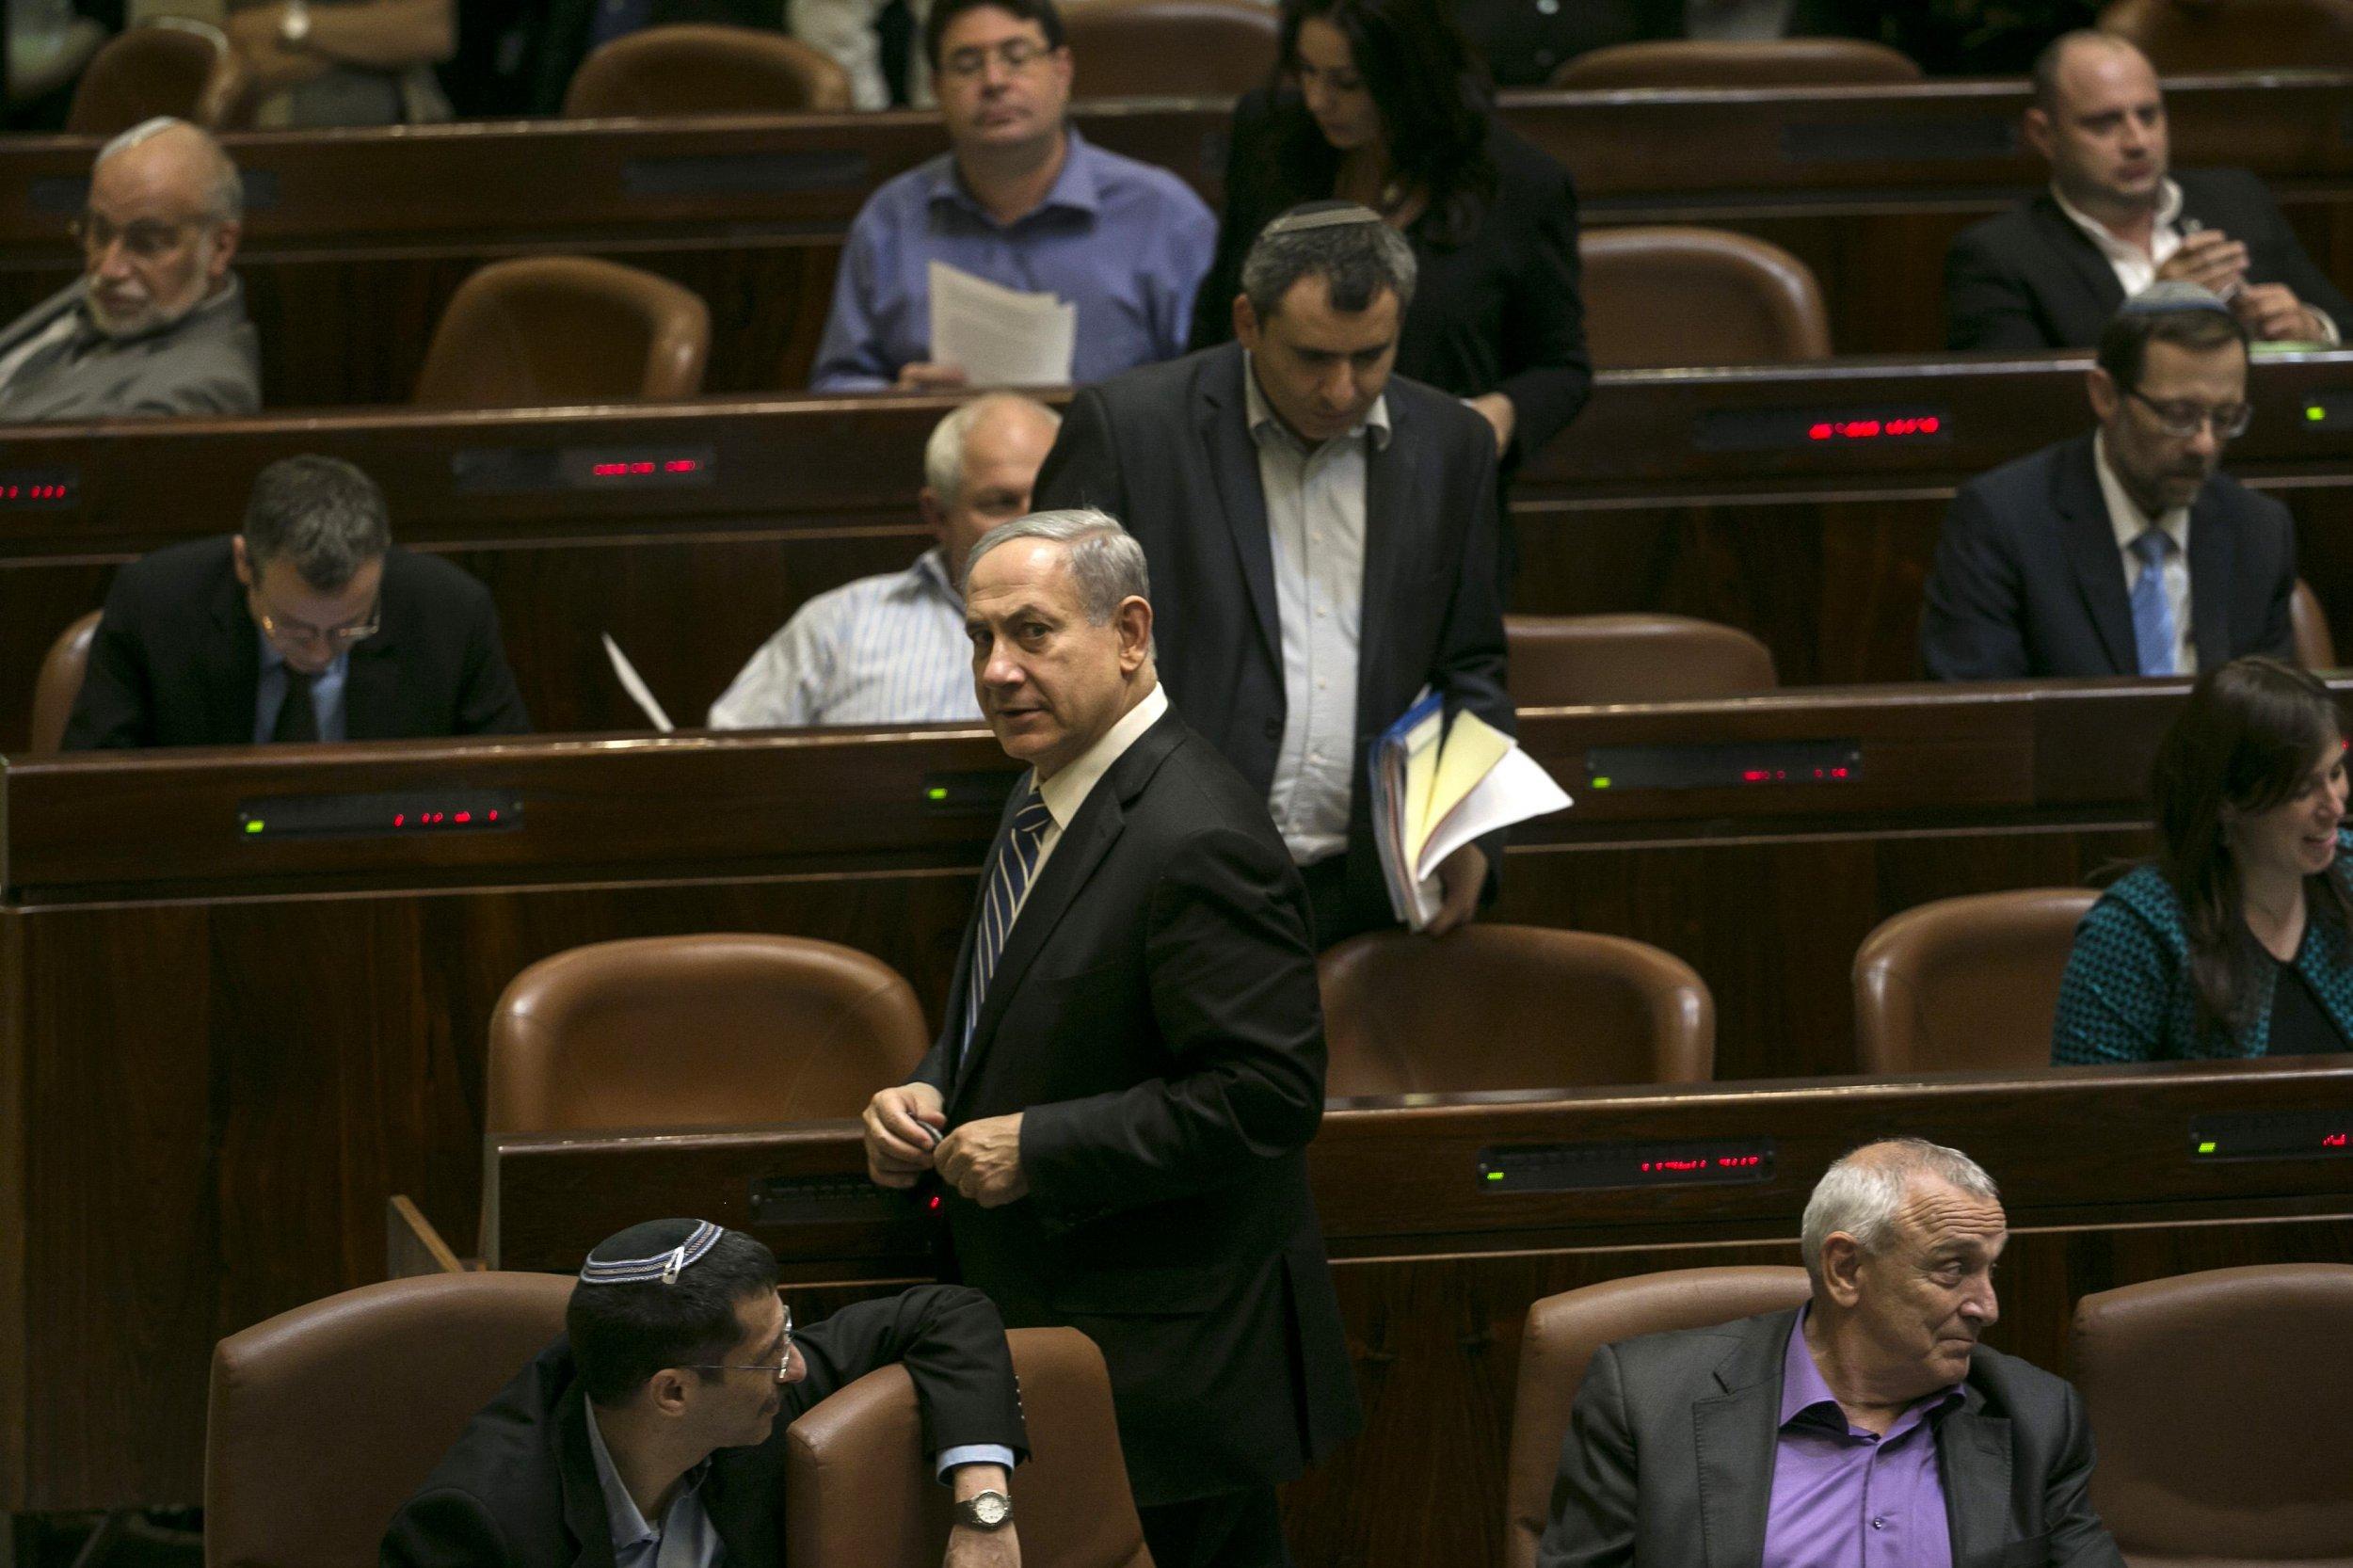 2014-12-08T205014Z_941327984_GM1EAC90DCM01_RTRMADP_3_ISRAEL-POLITICS